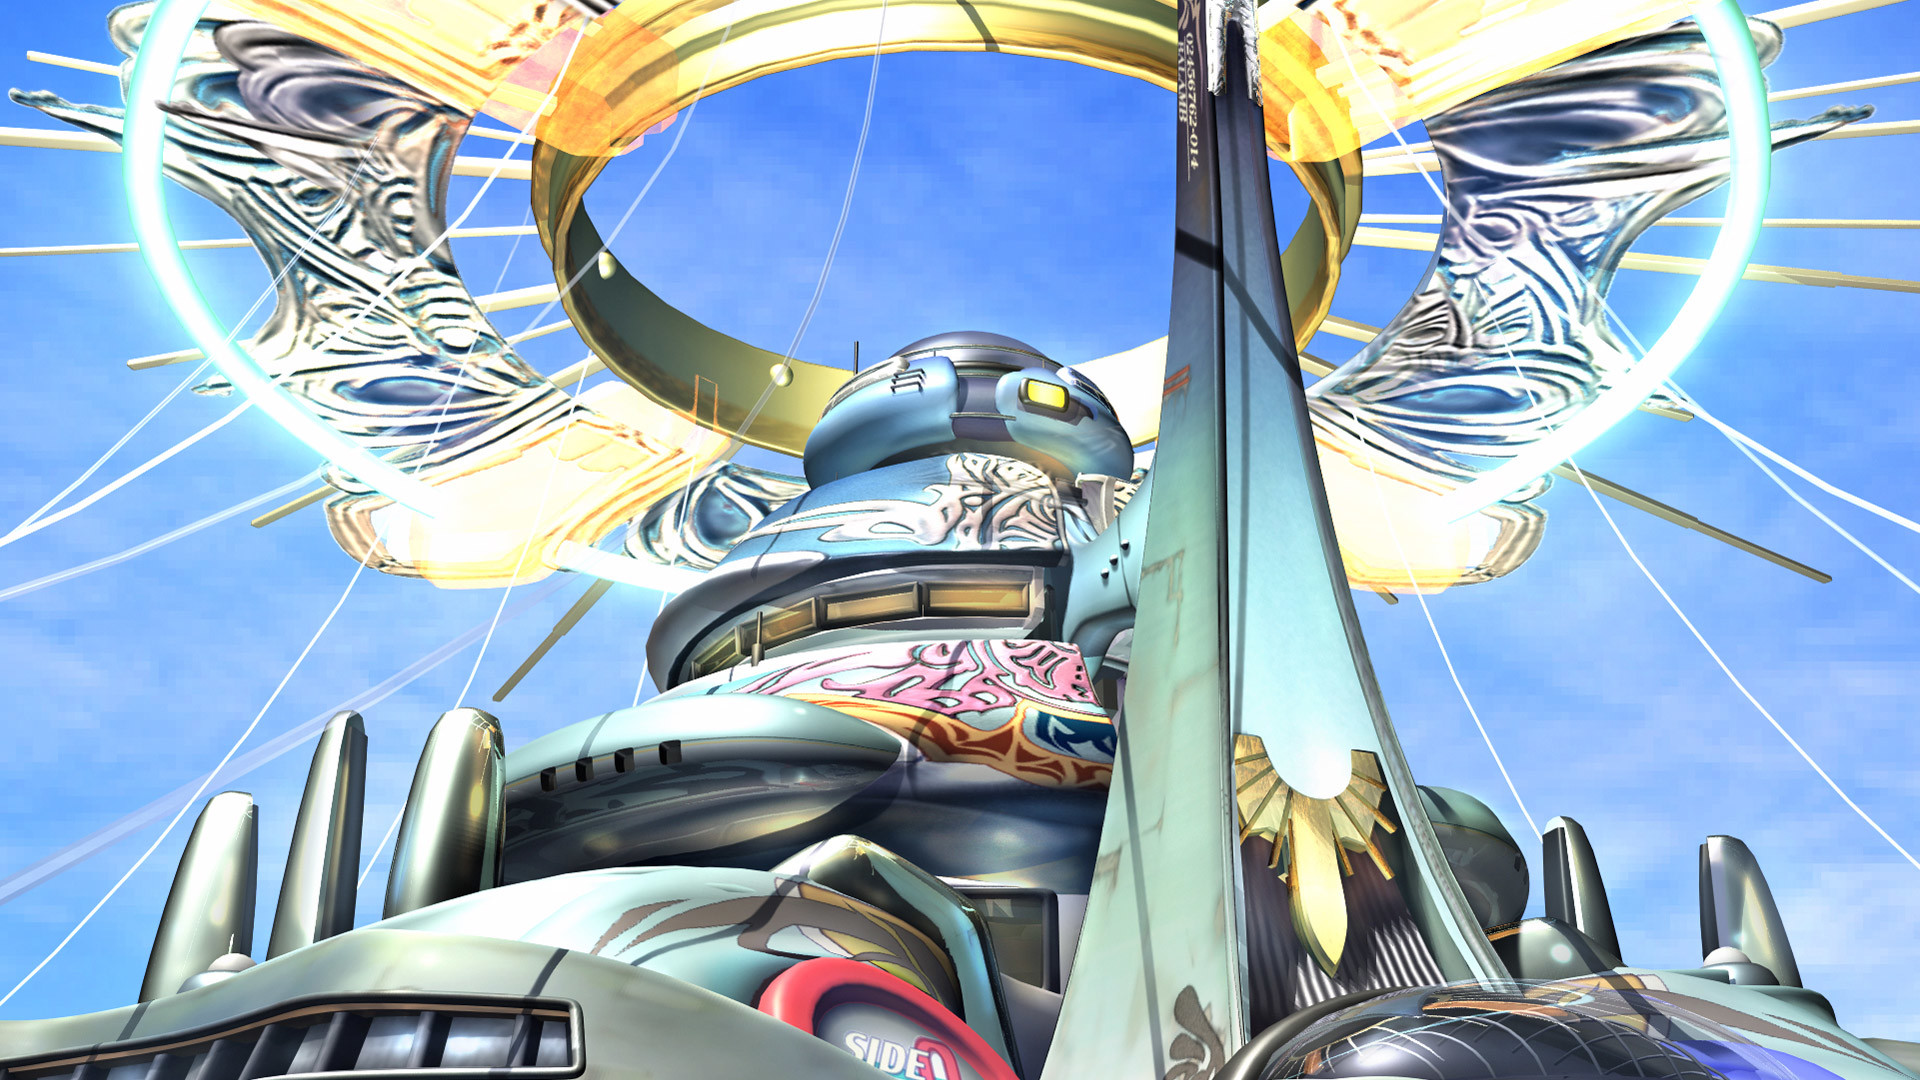 Final Fantasy 7 Iphone Wallpaper Final Fantasy 8 Wallpaper Hd 76 Images